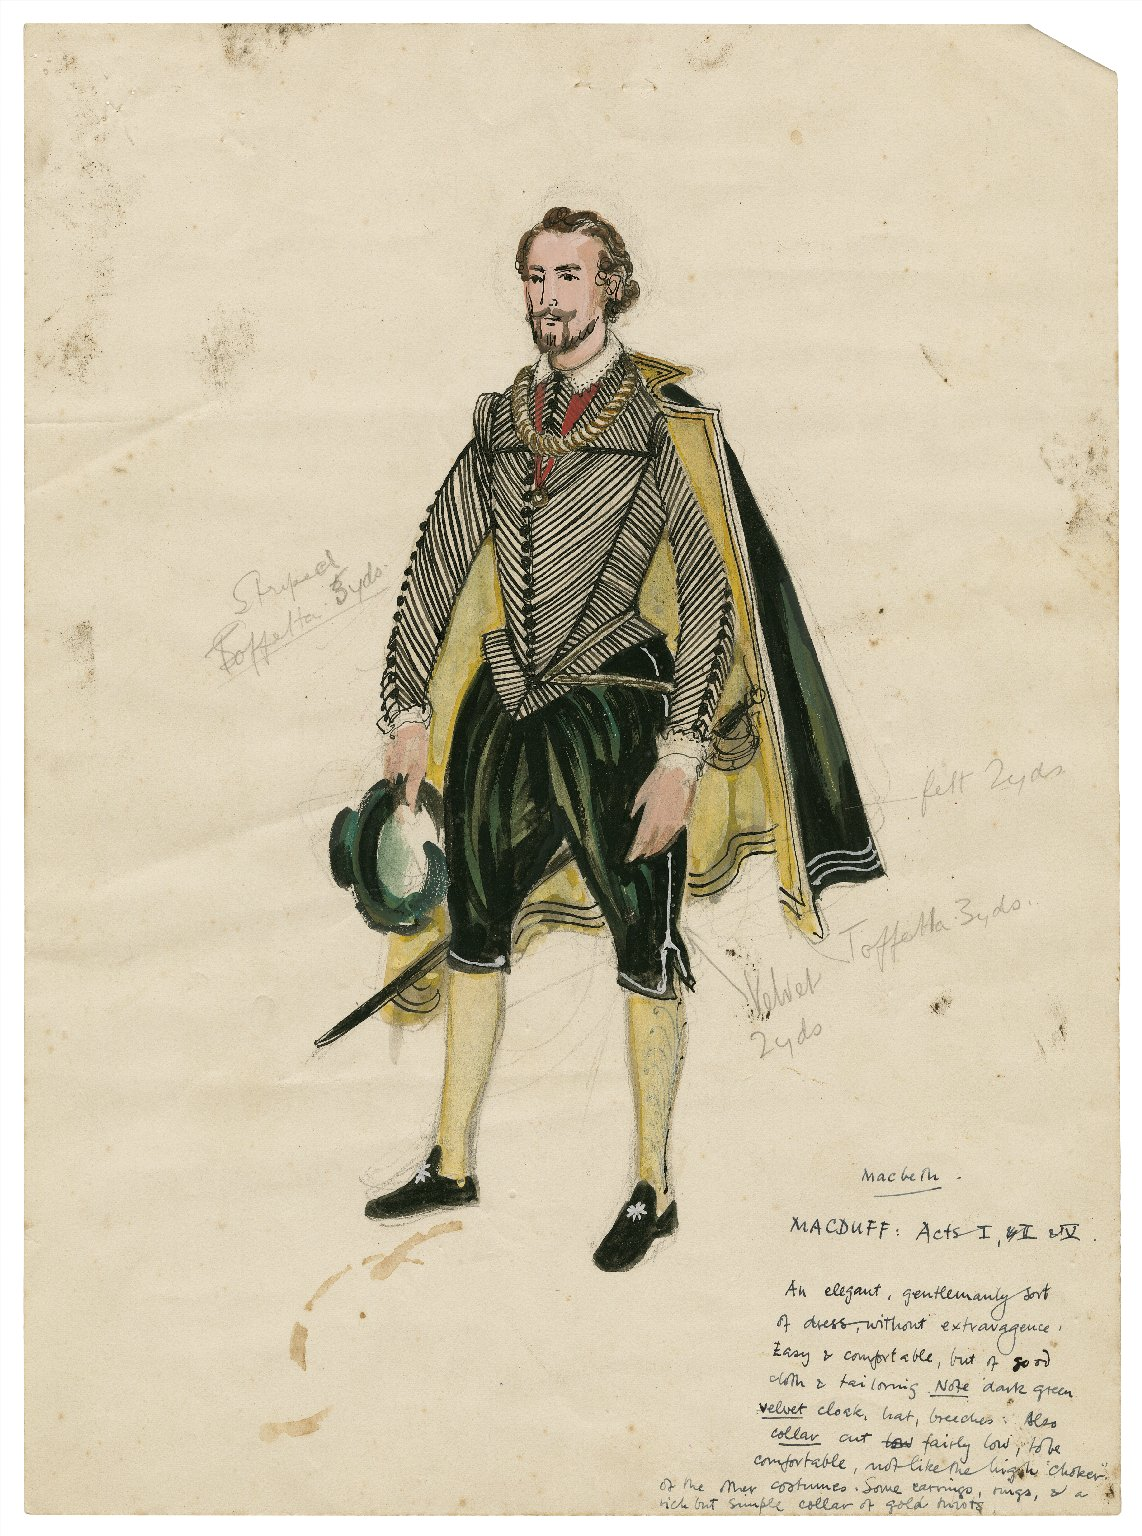 Costume design for Macduff